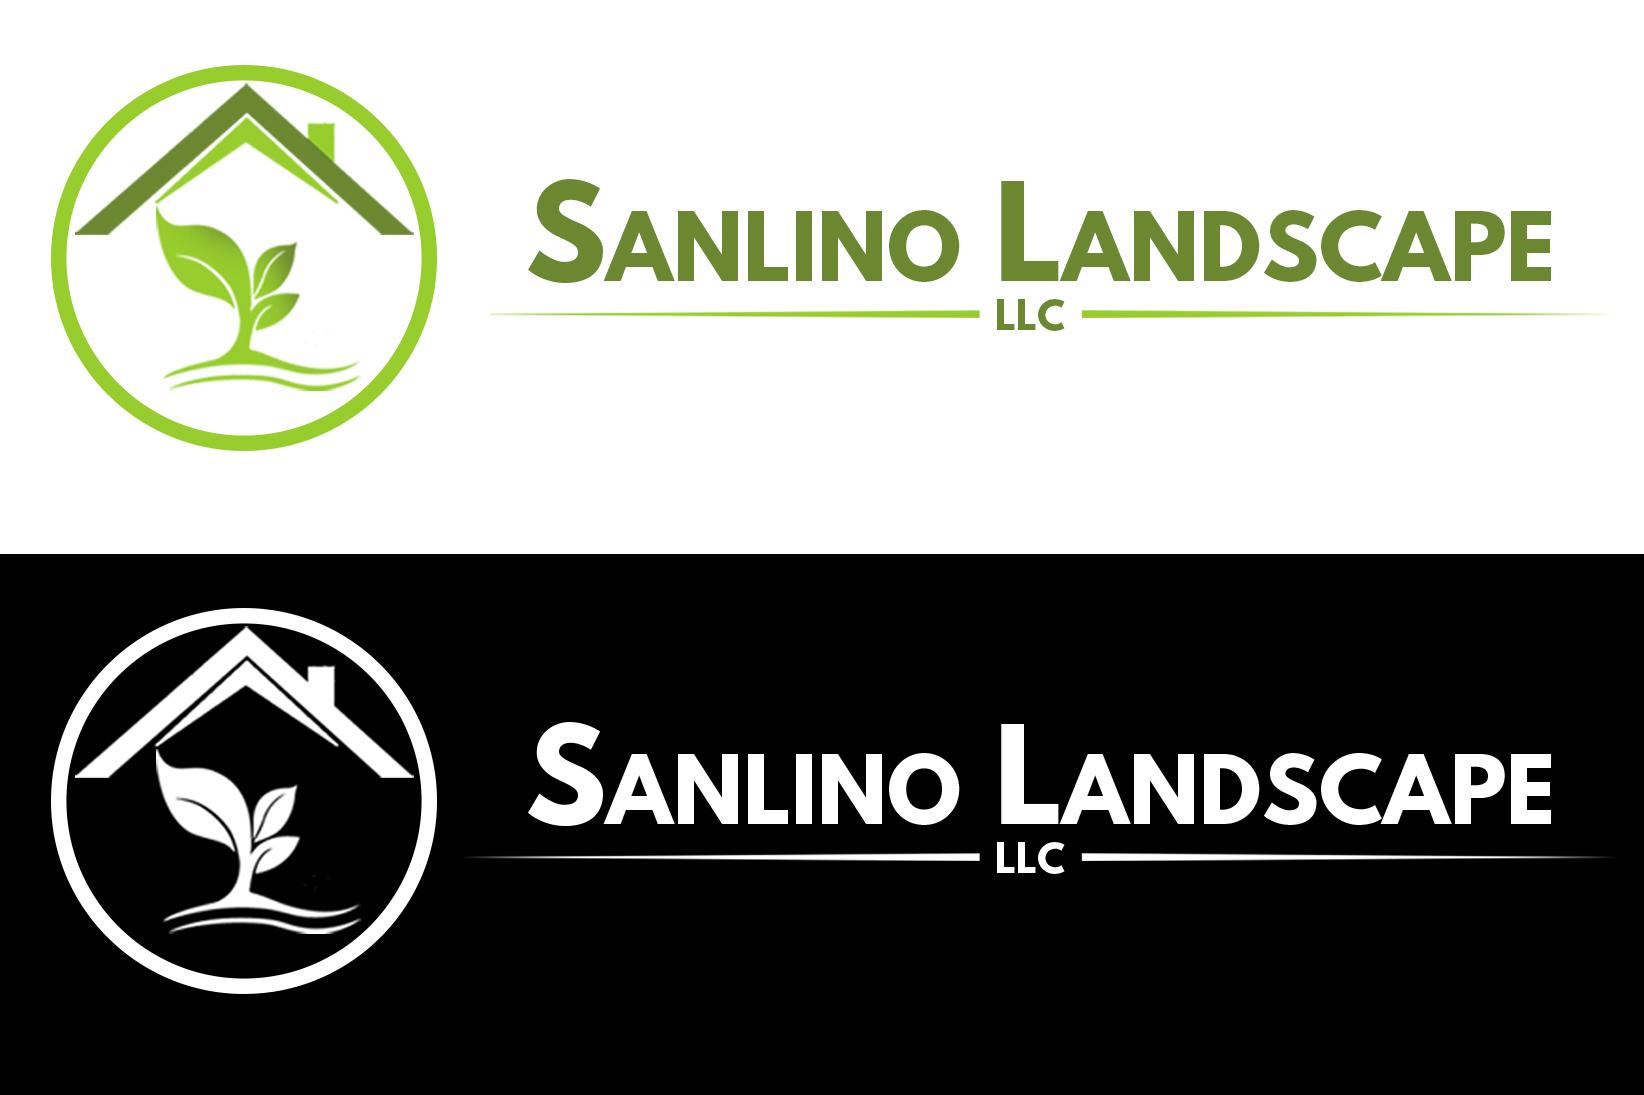 Logo Design by Aljohn Mana-ay - Entry No. 9 in the Logo Design Contest New Logo Design for Sanlino Landscape, LLC.